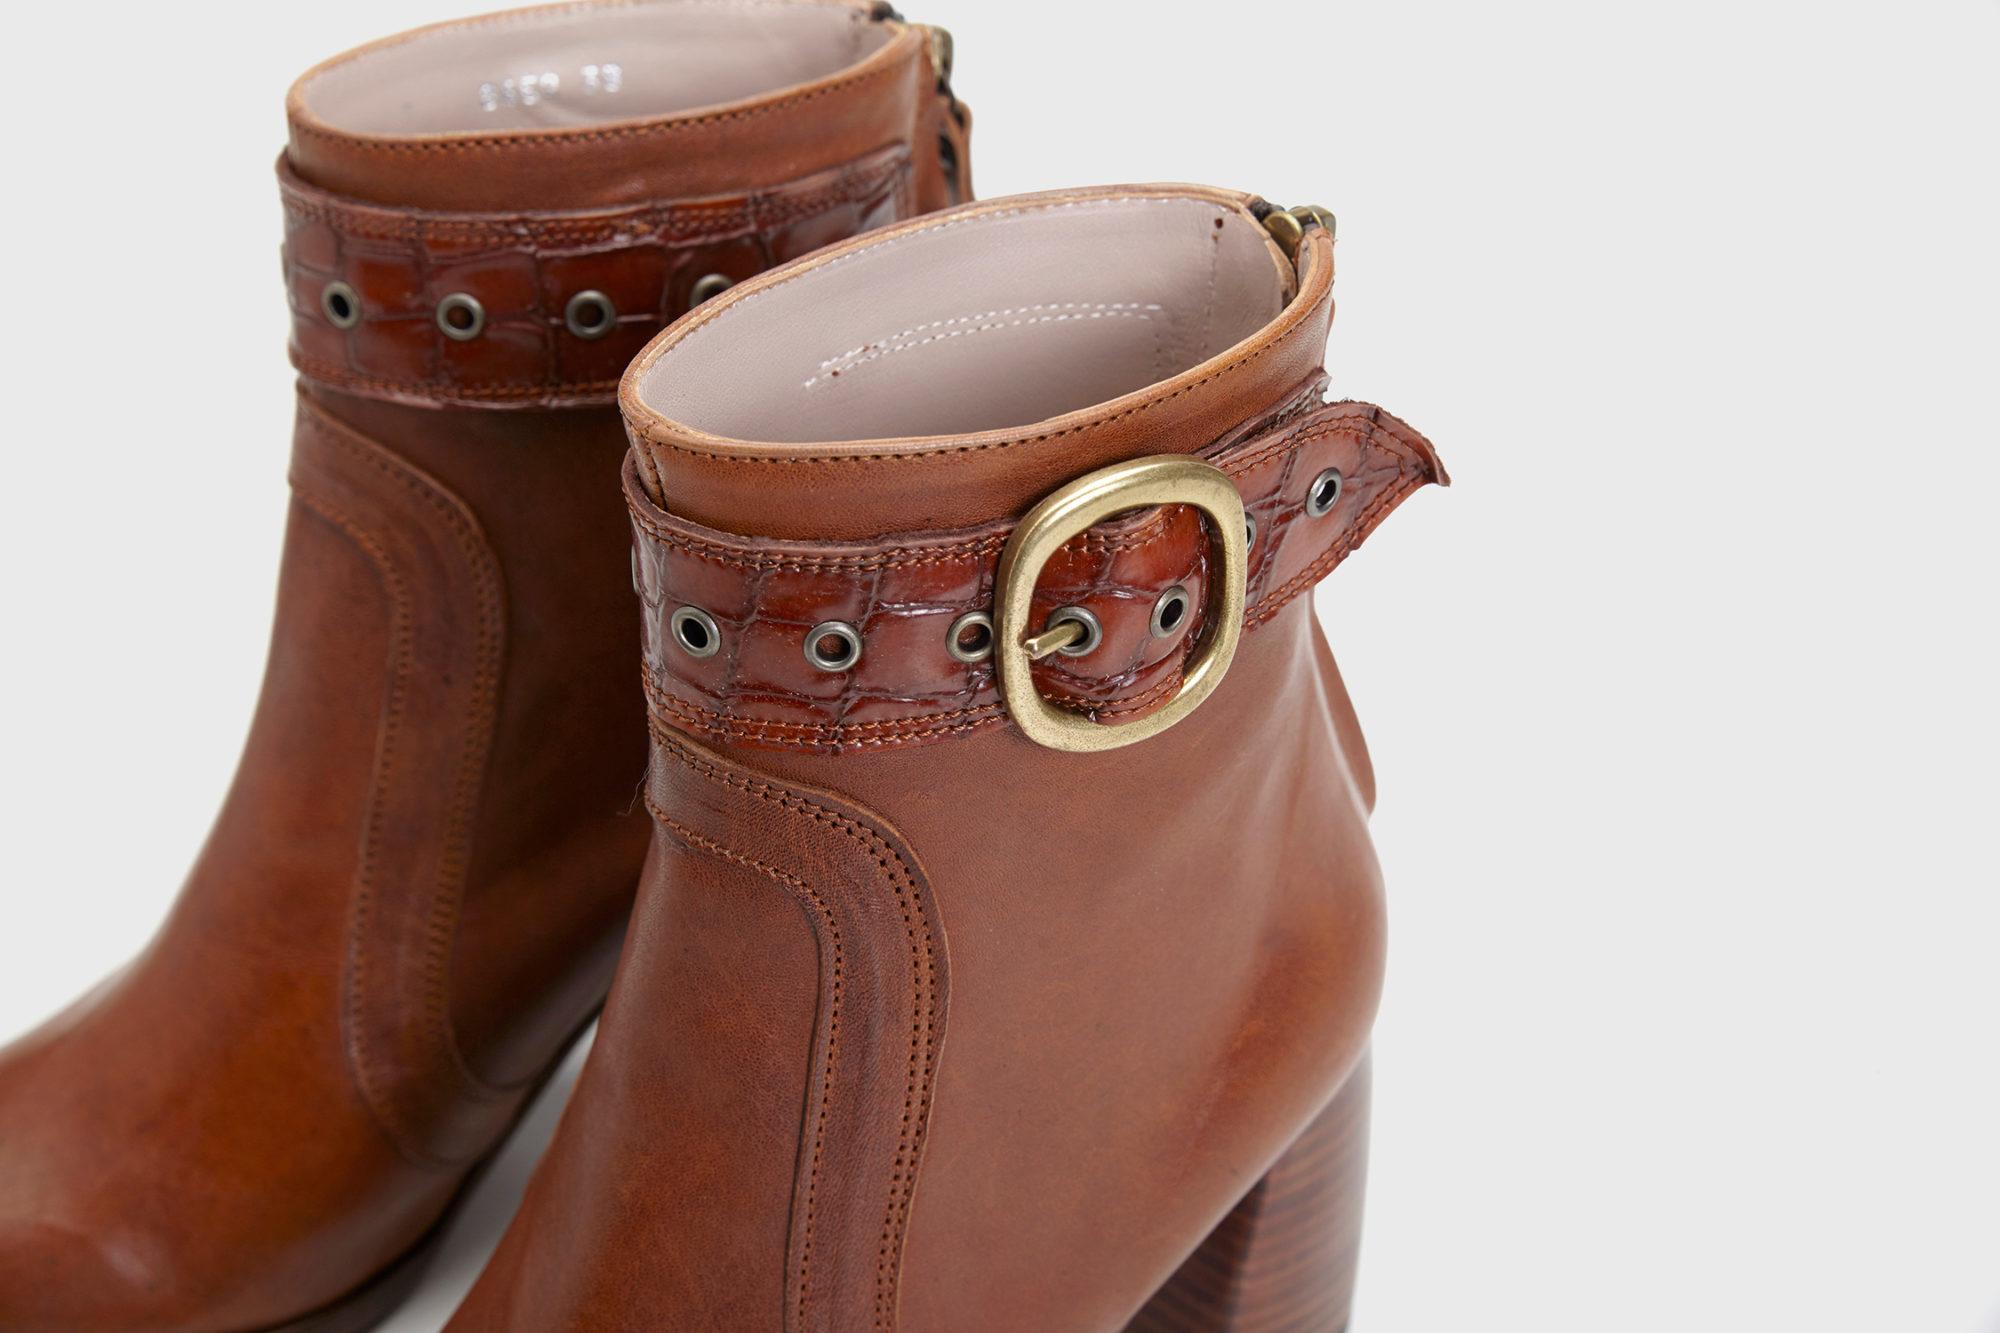 Dorotea botín de tacón alto Norah color cuero fw17 detalle